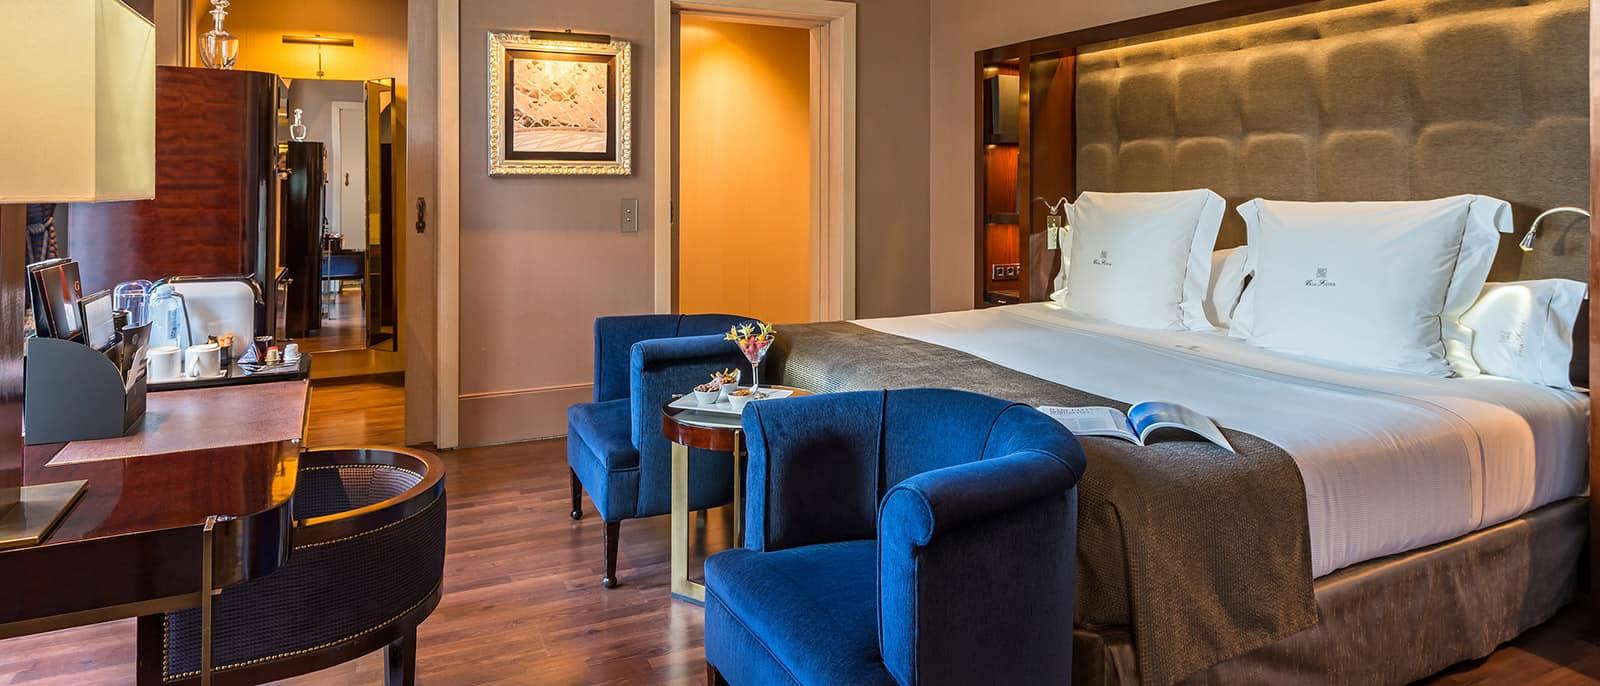 hotels in barcelona - Hotel Casa Fuster